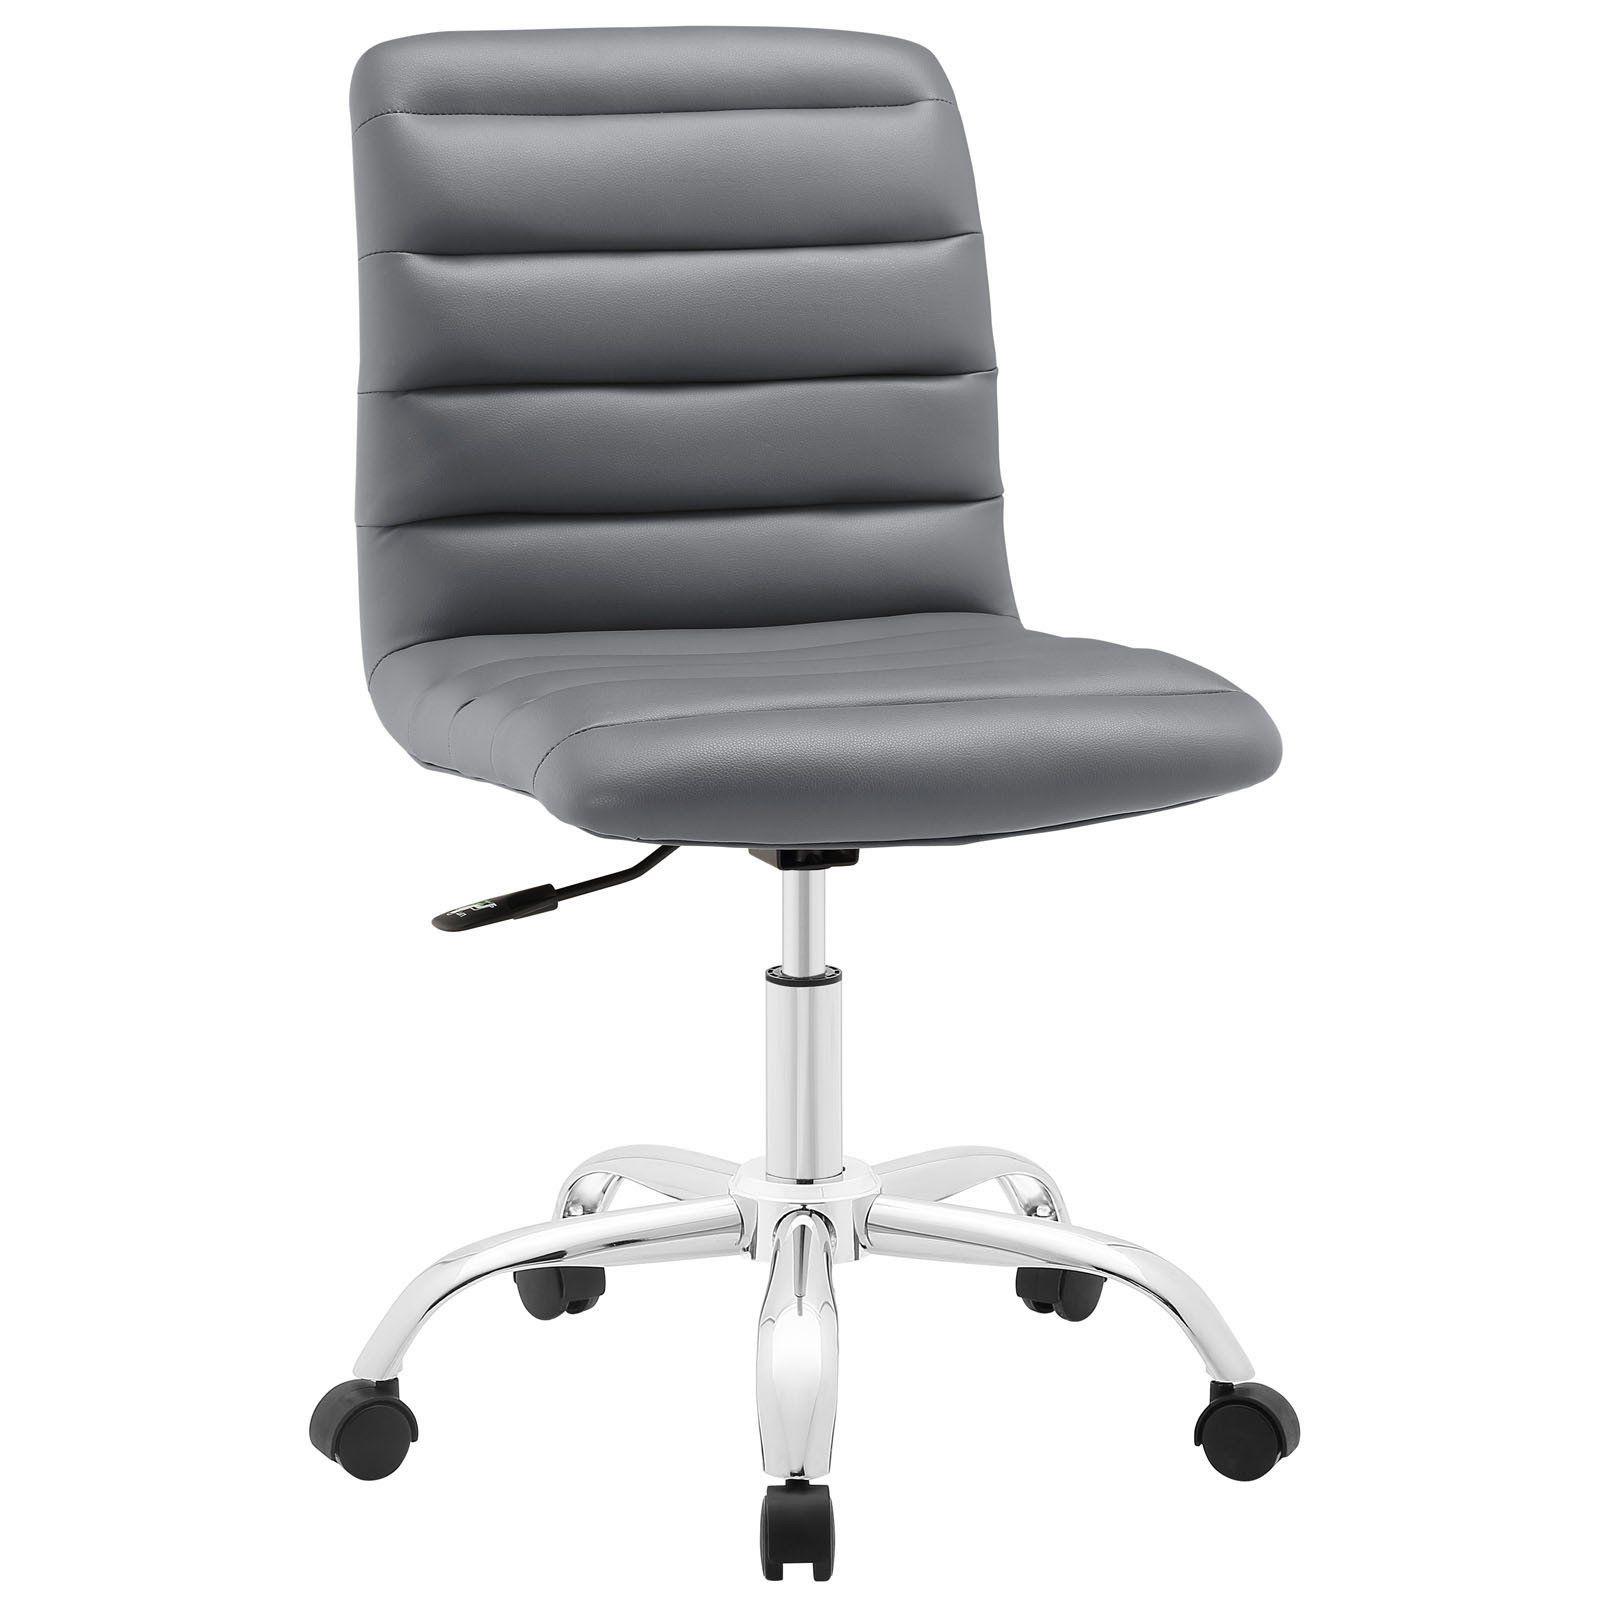 Modway Modern Ripple Mid Back Adjustable Computer Office Chair EEI-1532